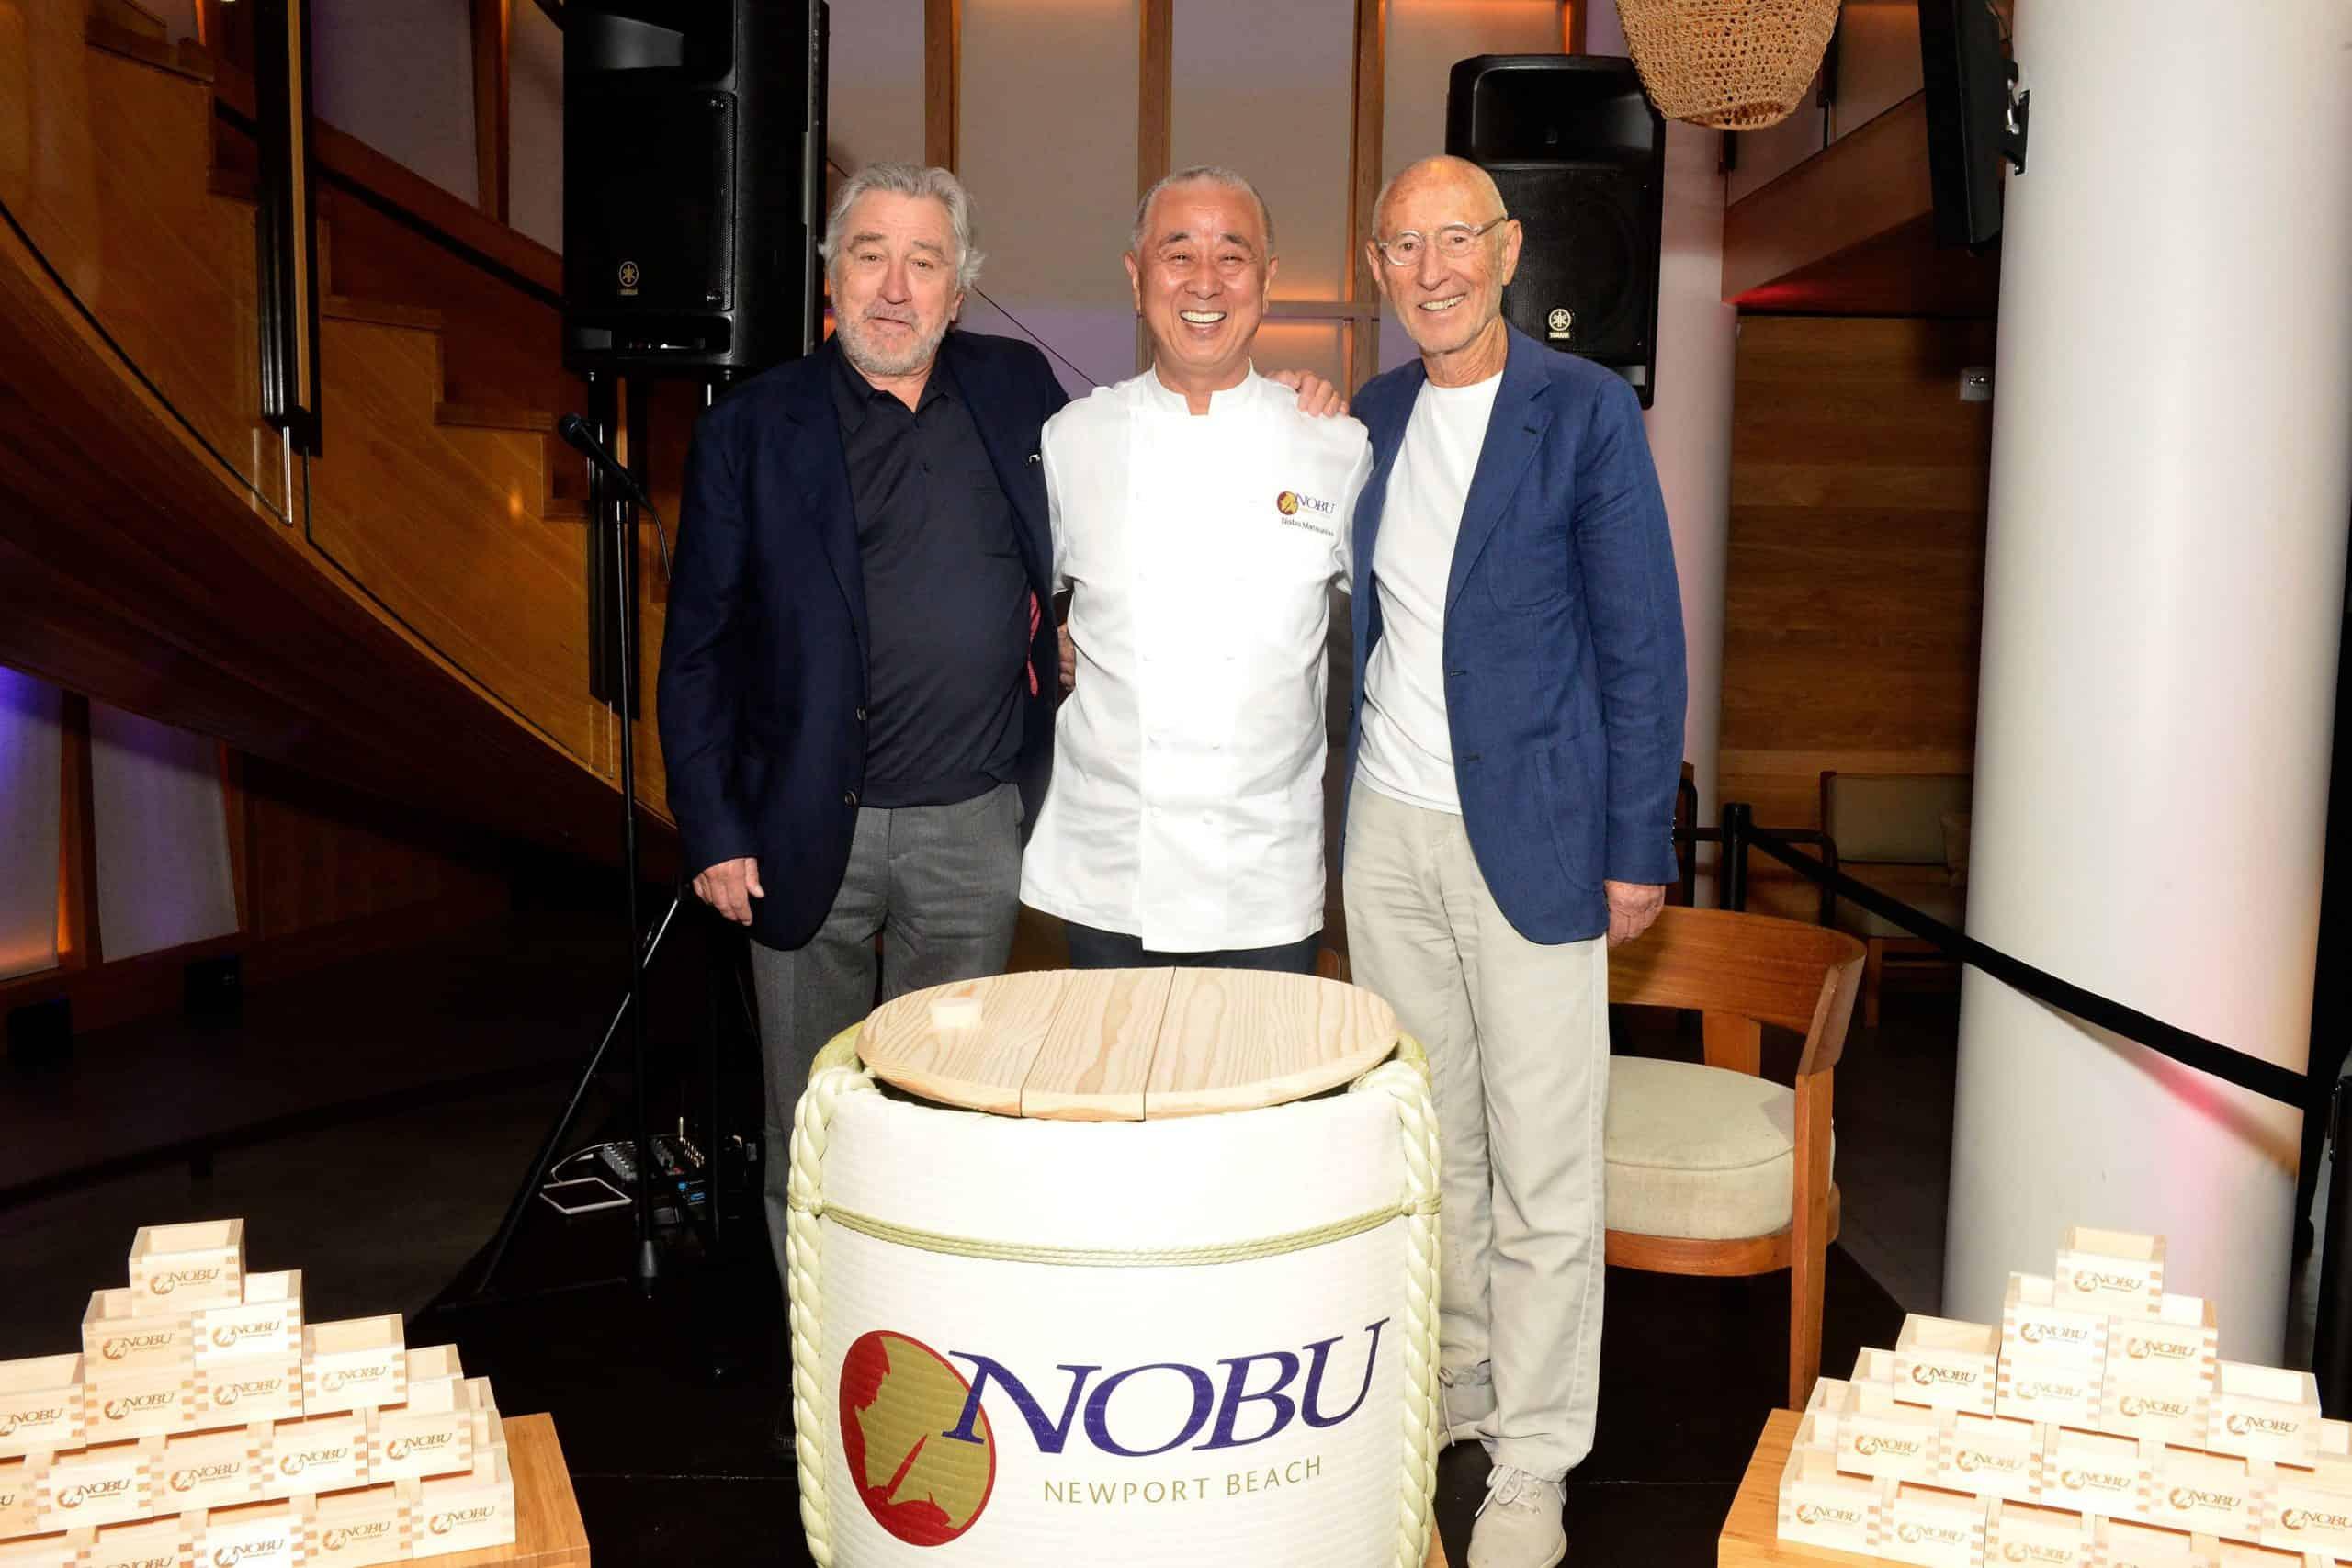 Nobu_Hospitality_Founders_Robert_De_Niro_Nobu_Matsuhisa_Meir_Teper-scaled